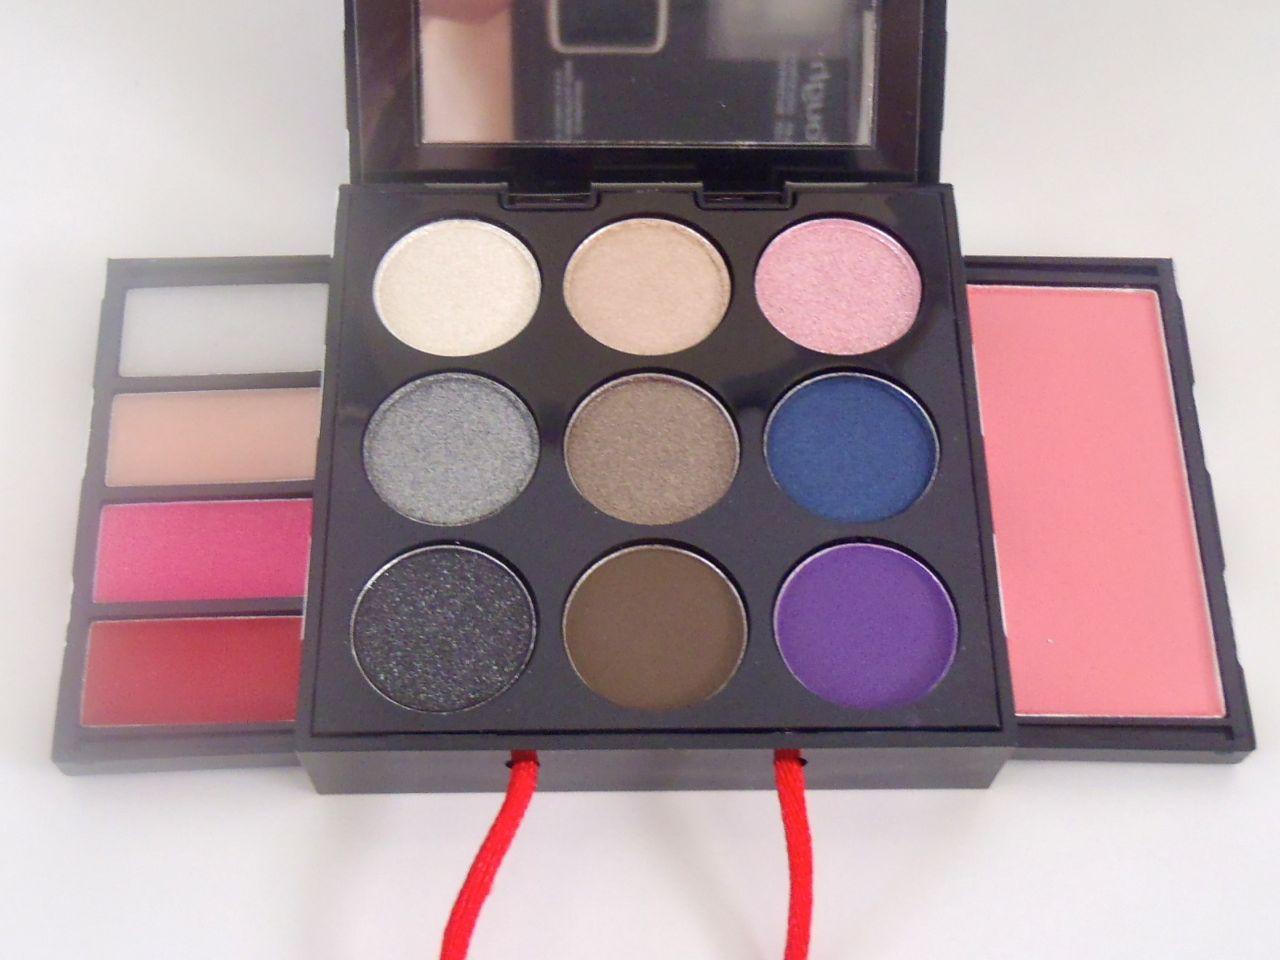 Sephora Mini Makeup Palette Review - Mugeek Vidalondon